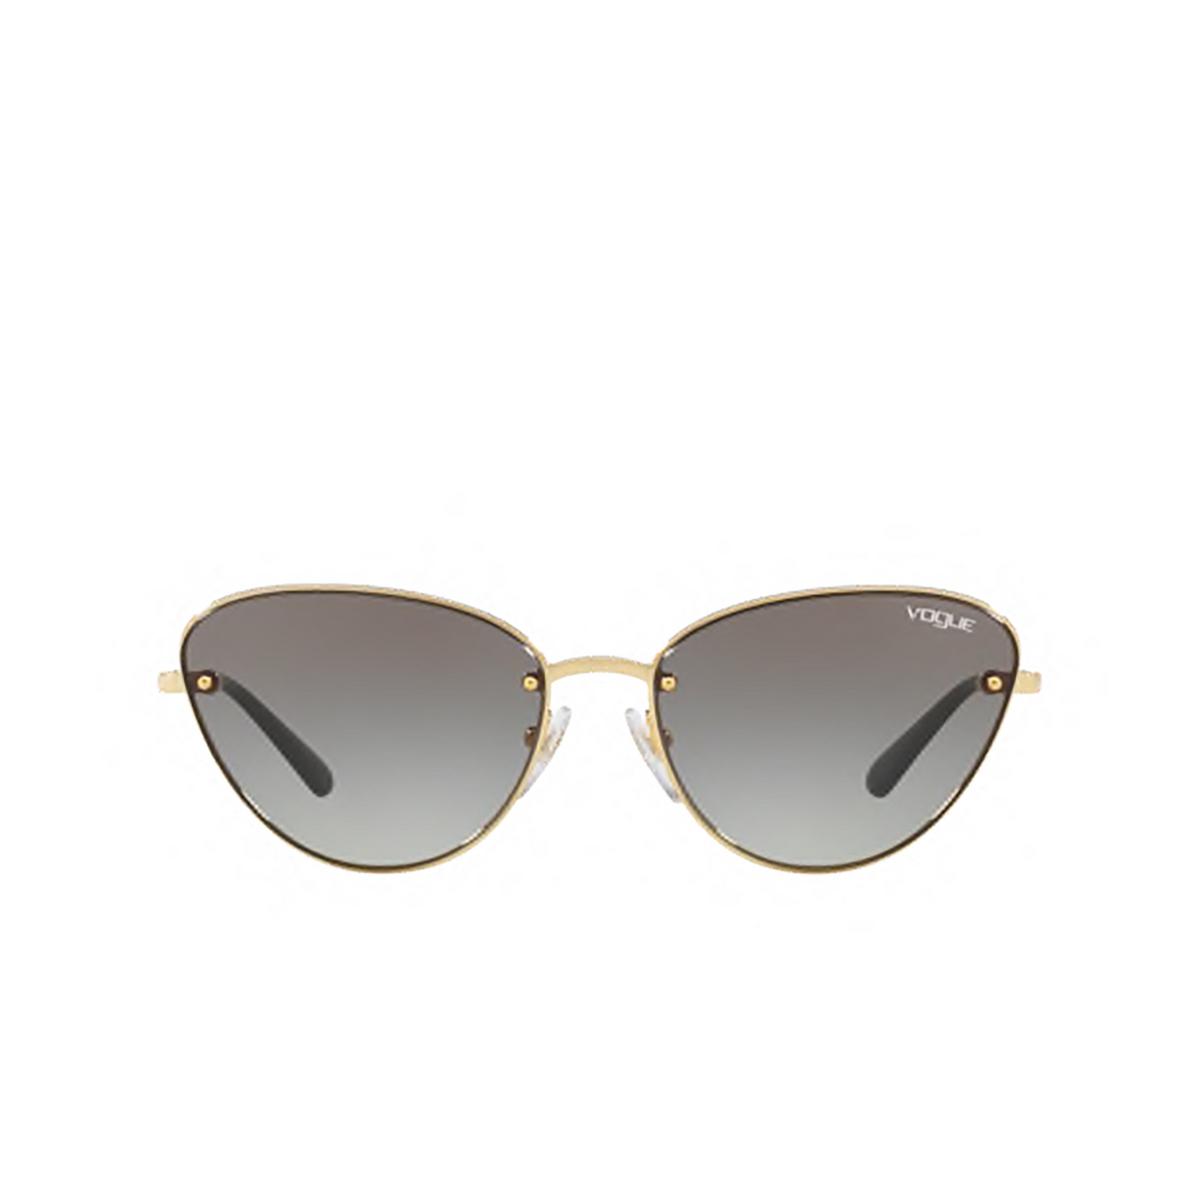 Vogue® Cat-eye Sunglasses: VO4111S color Gold 280/11 - 1/3.